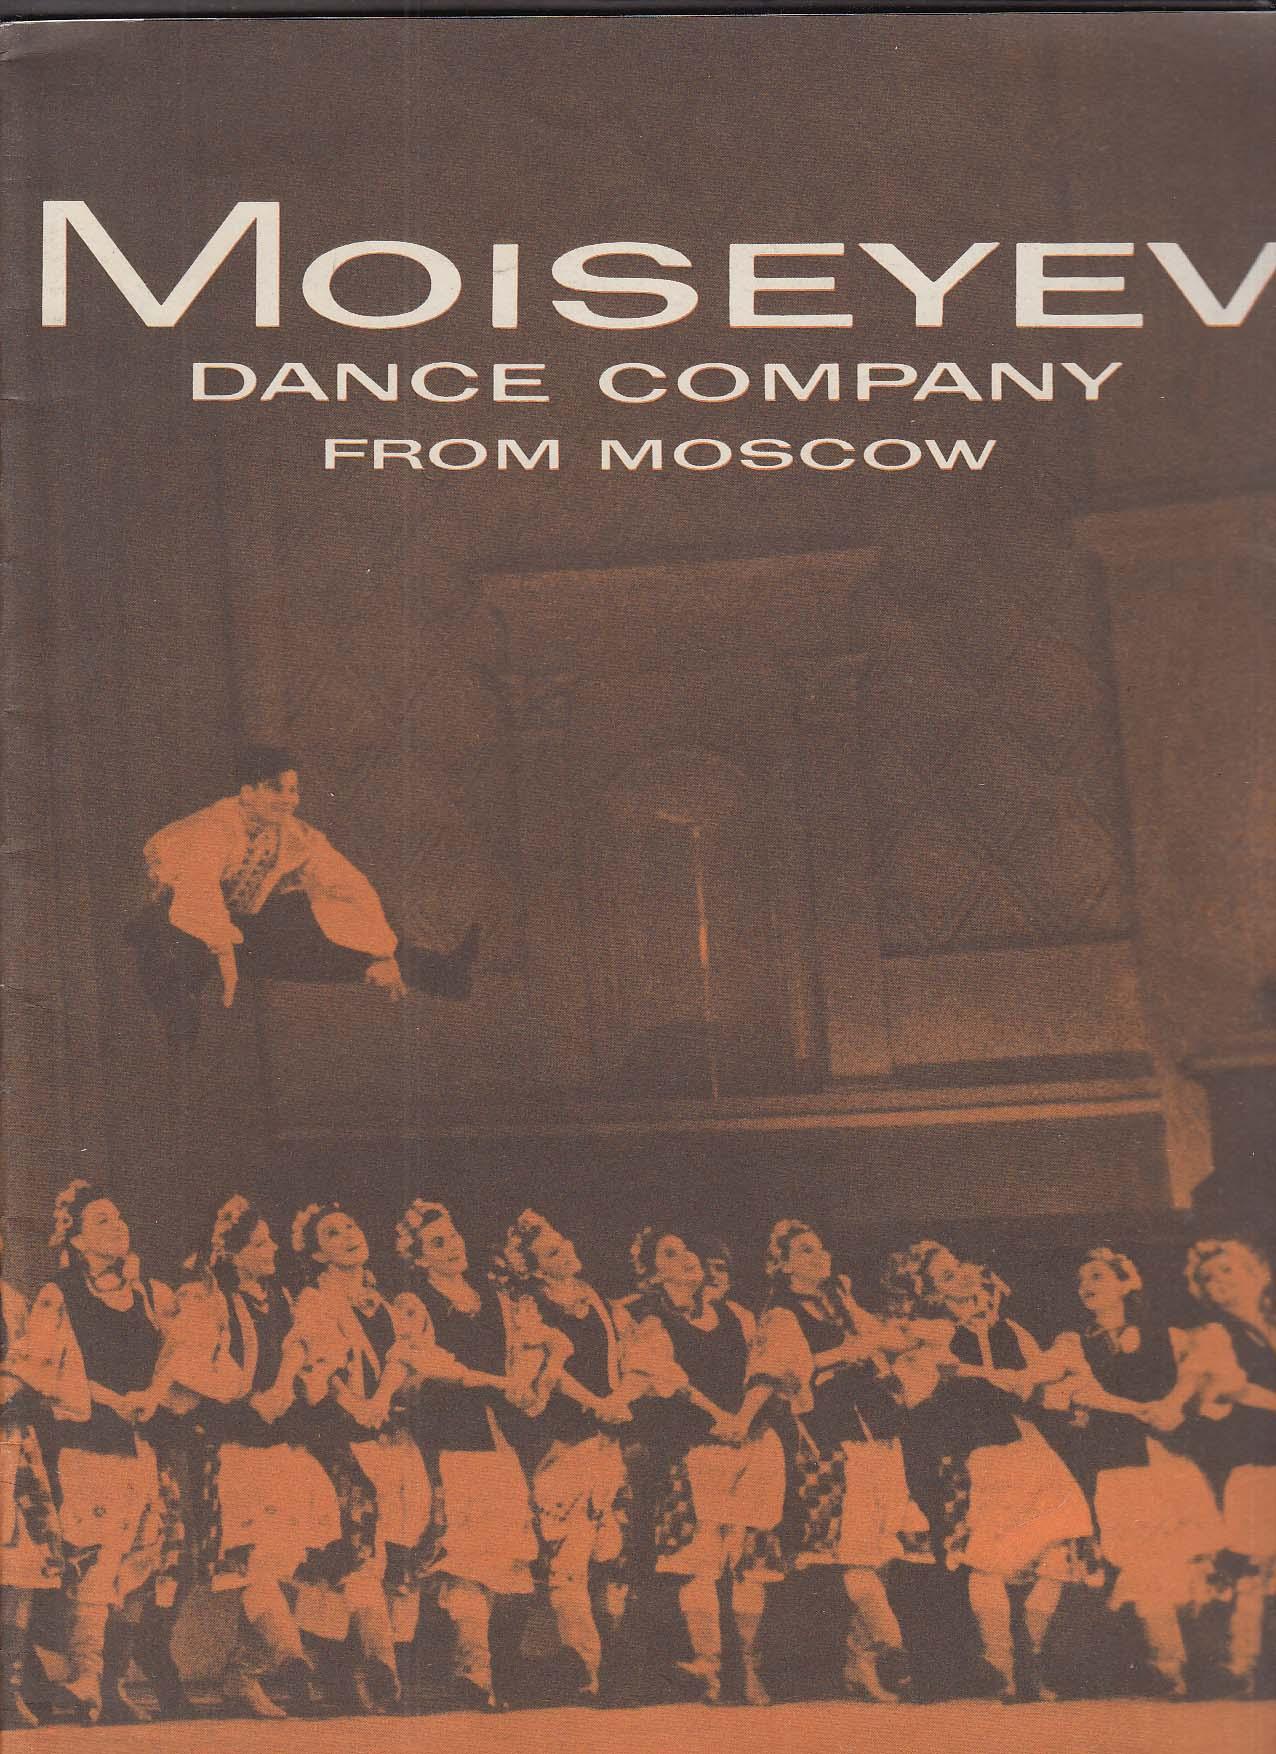 1958 Moiseyev Dance Company program